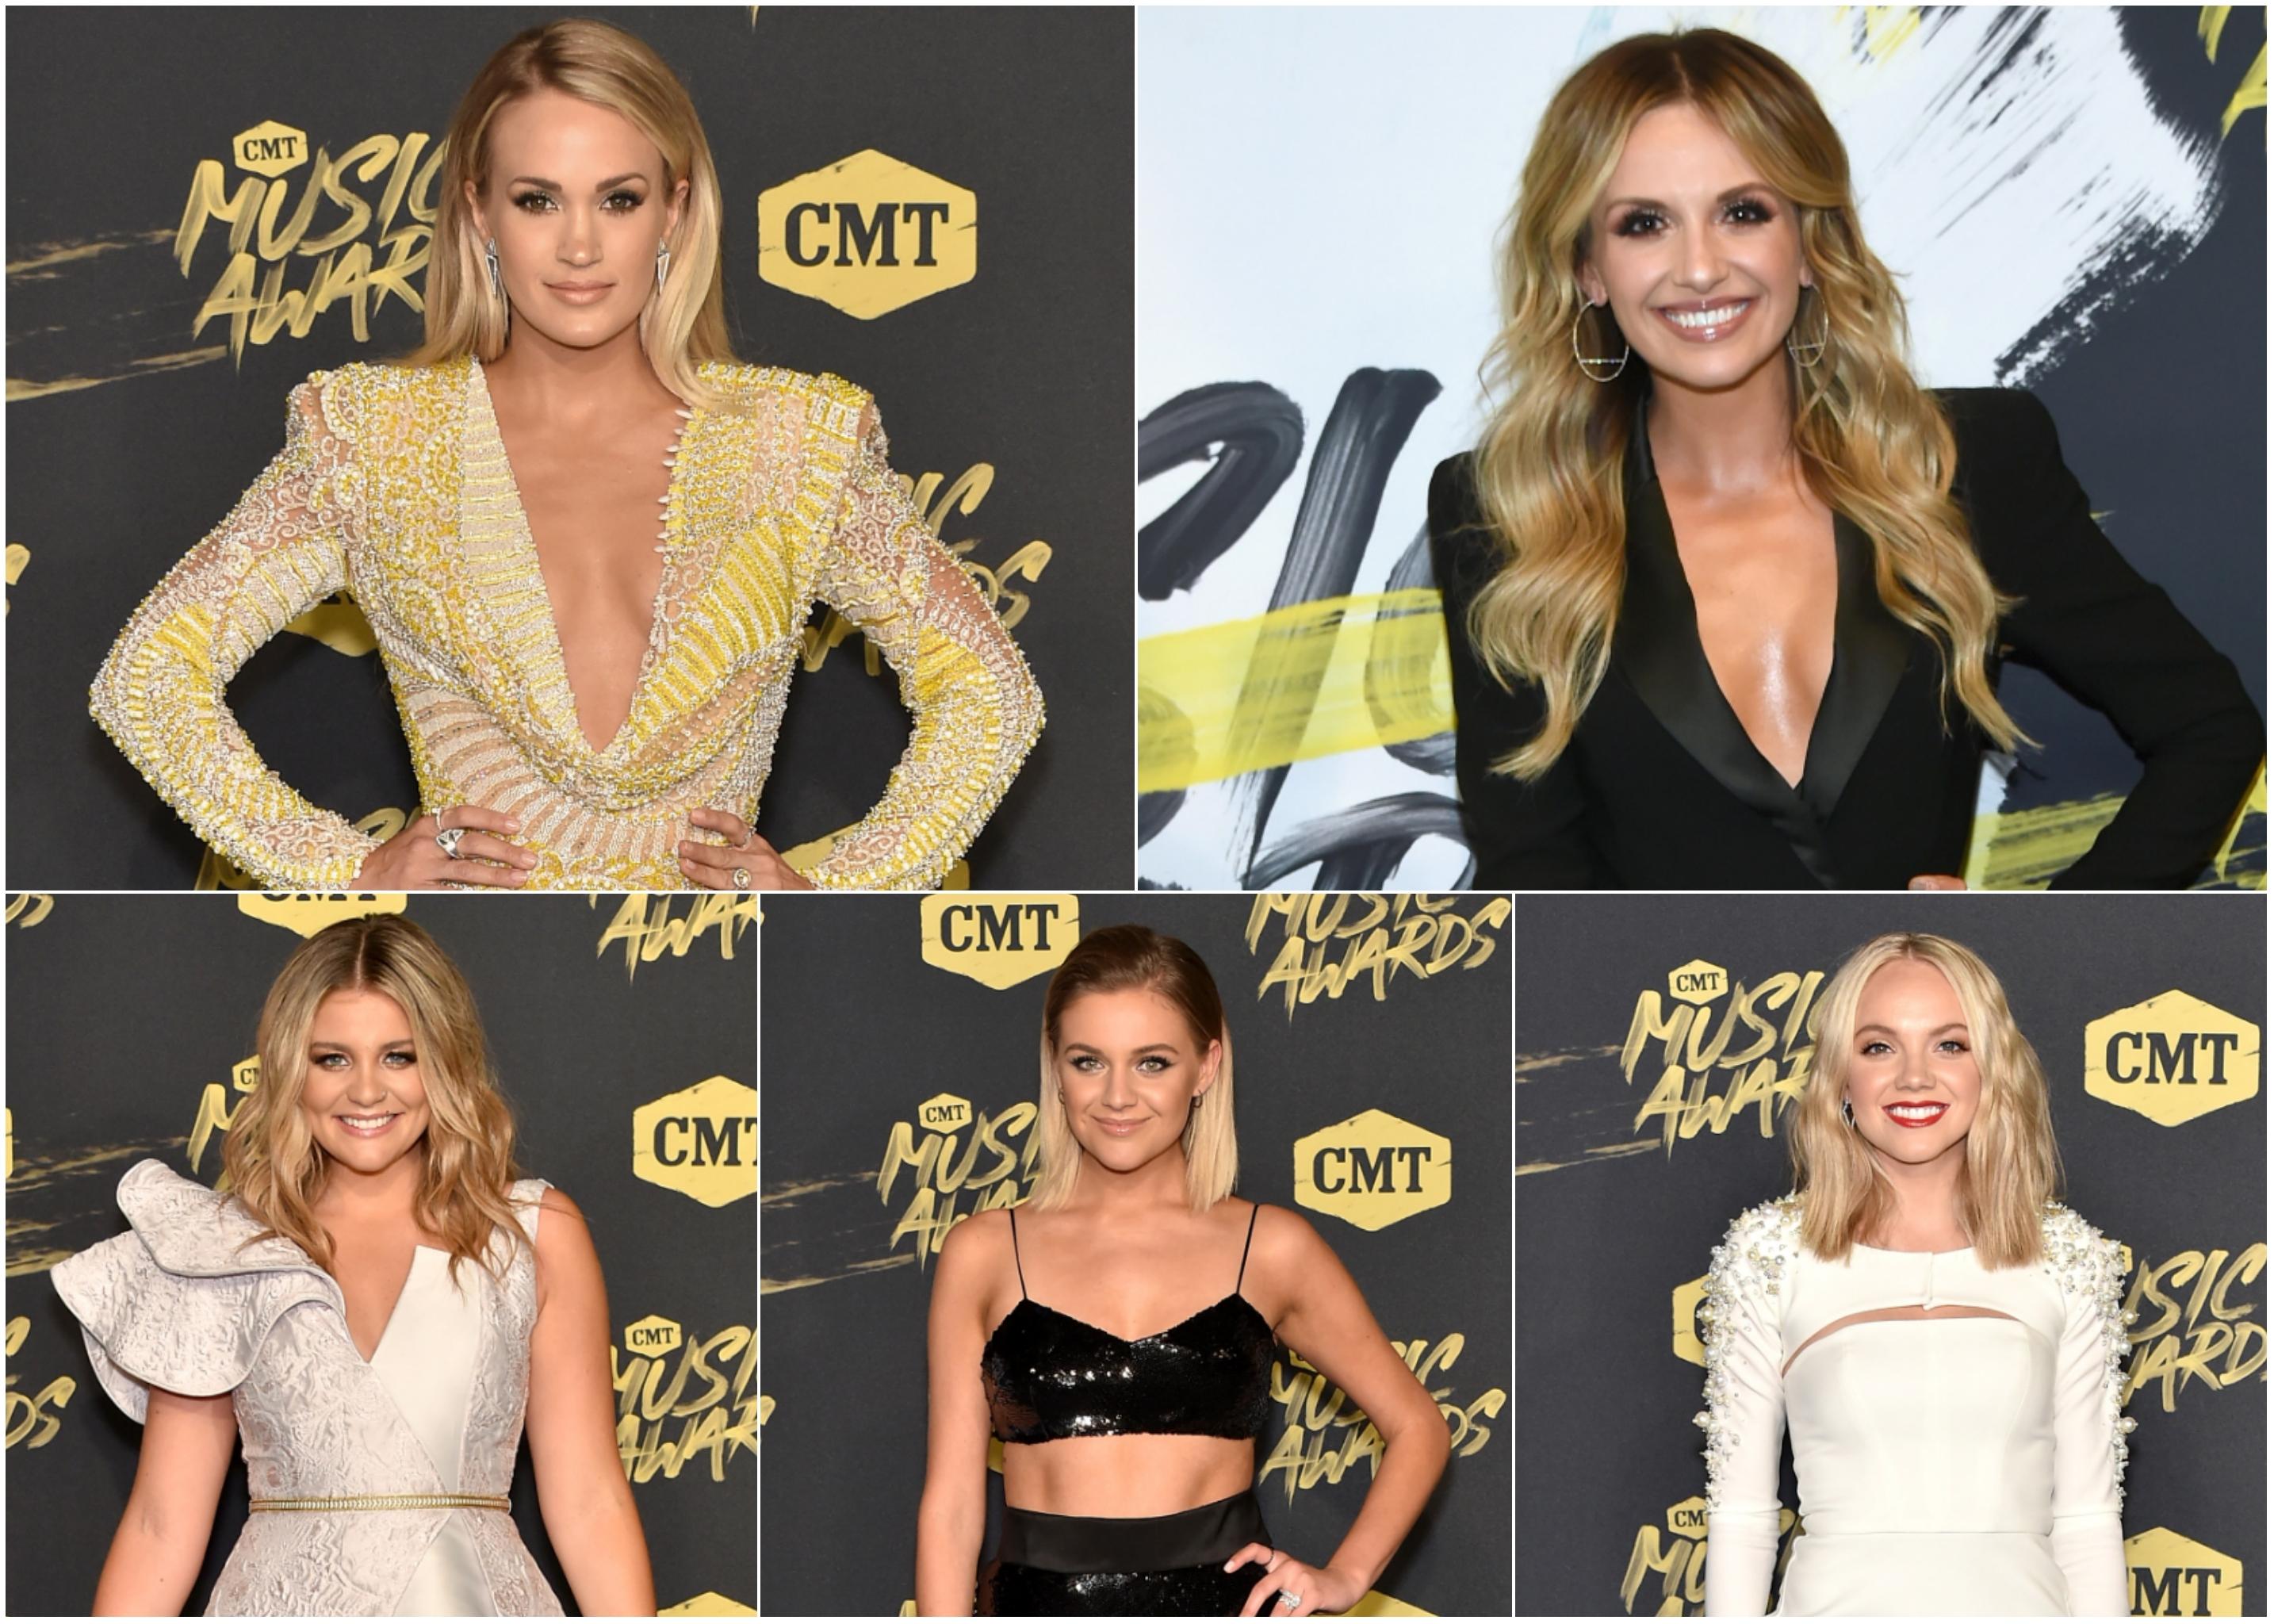 Carrie Underwood Carly Pearce Lauren Alaina Kelsea Ballerini Danielle Bradbery CMT Awards